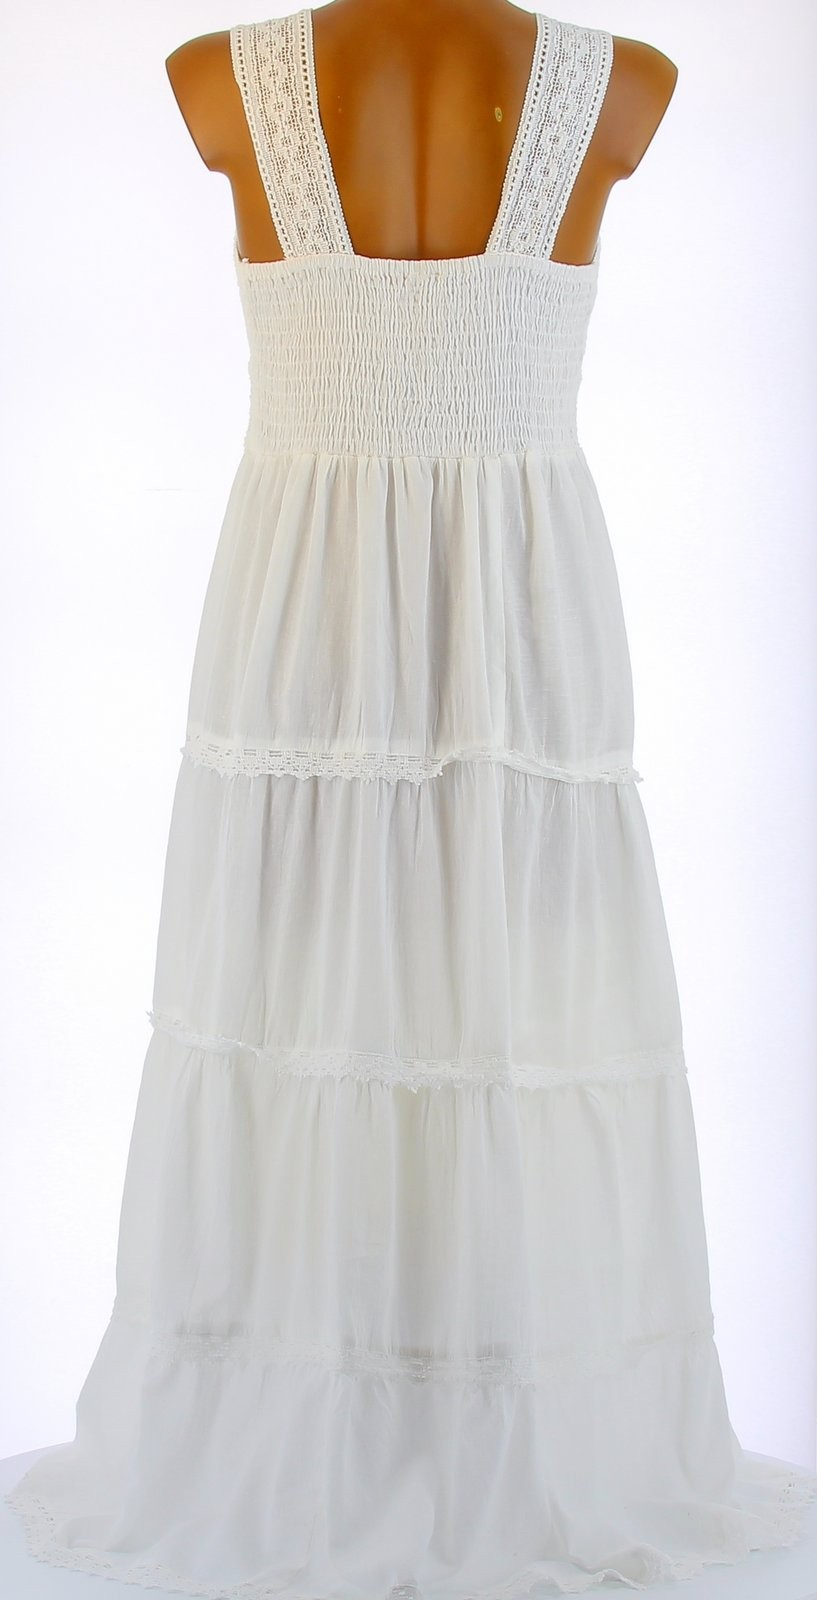 robe longue t dentelle coton boho blanche adriana blanc ebay. Black Bedroom Furniture Sets. Home Design Ideas